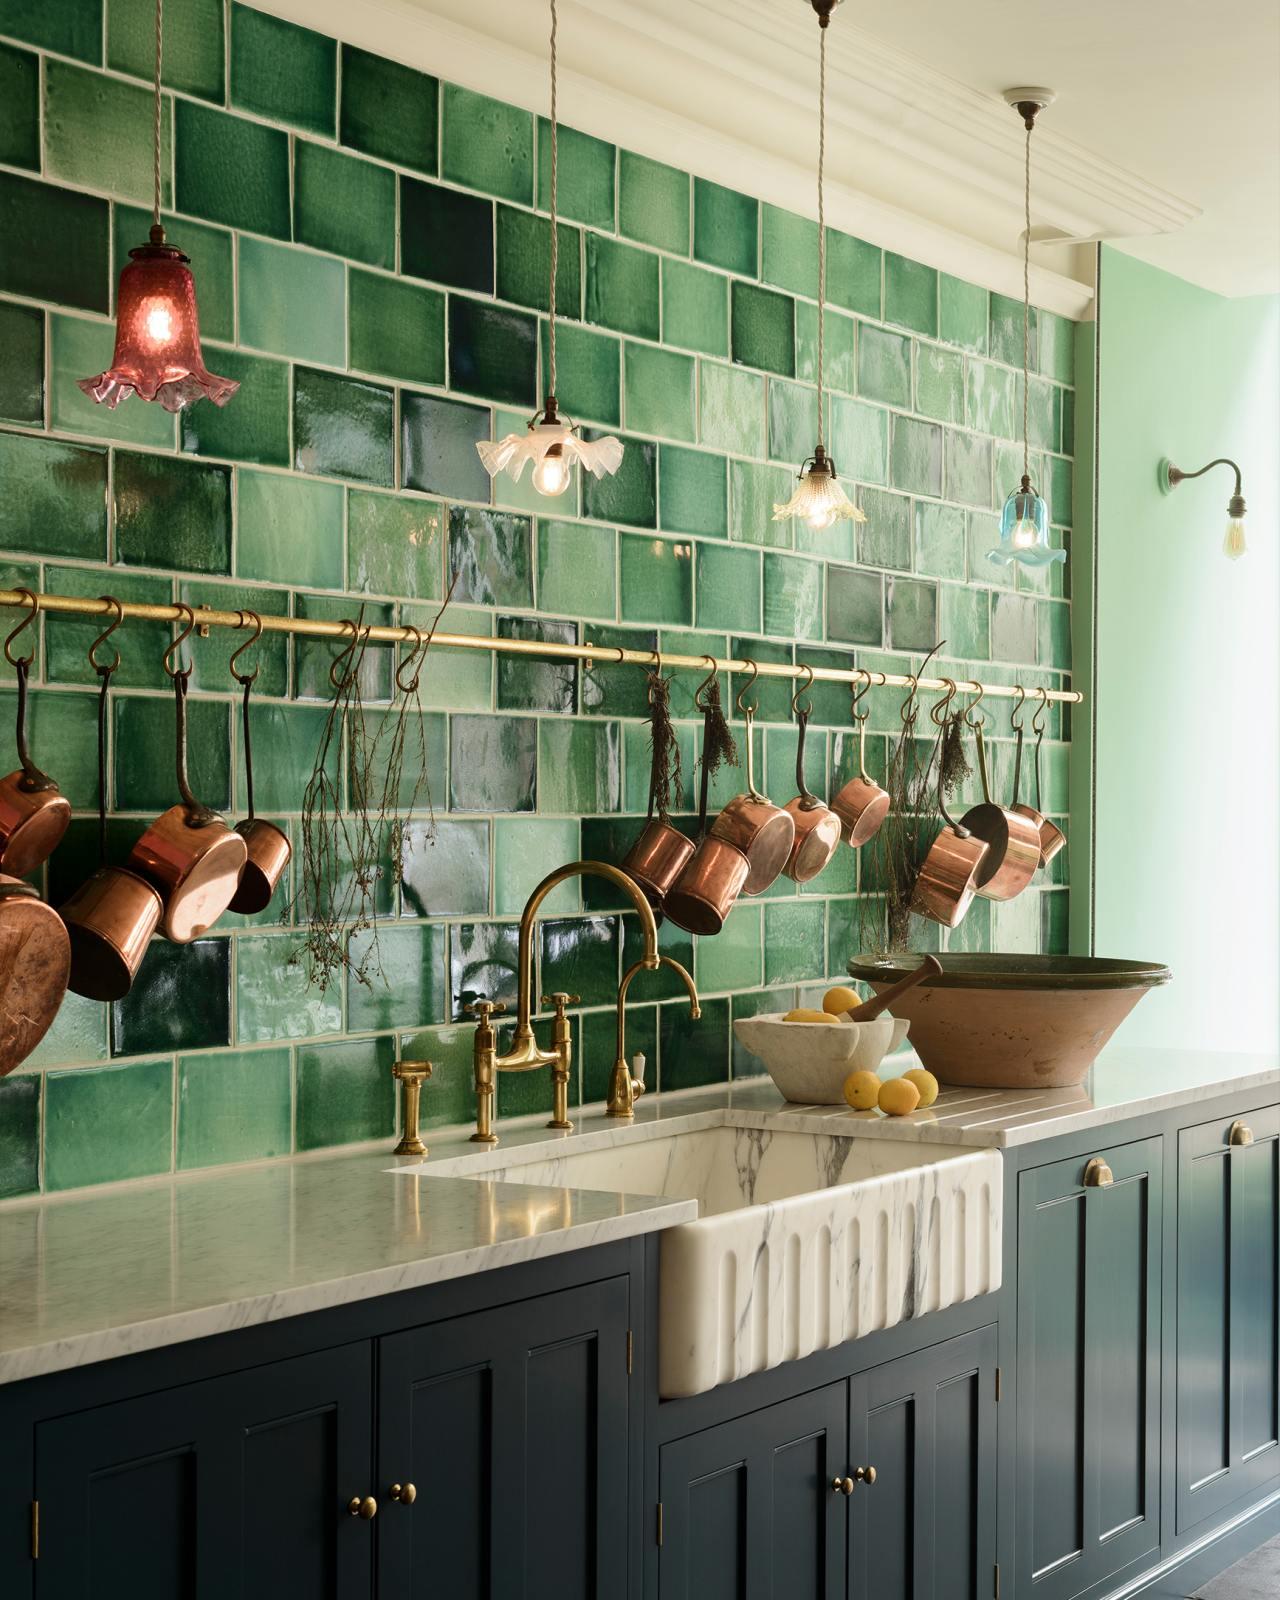 emerald green london tiles devol kitchens